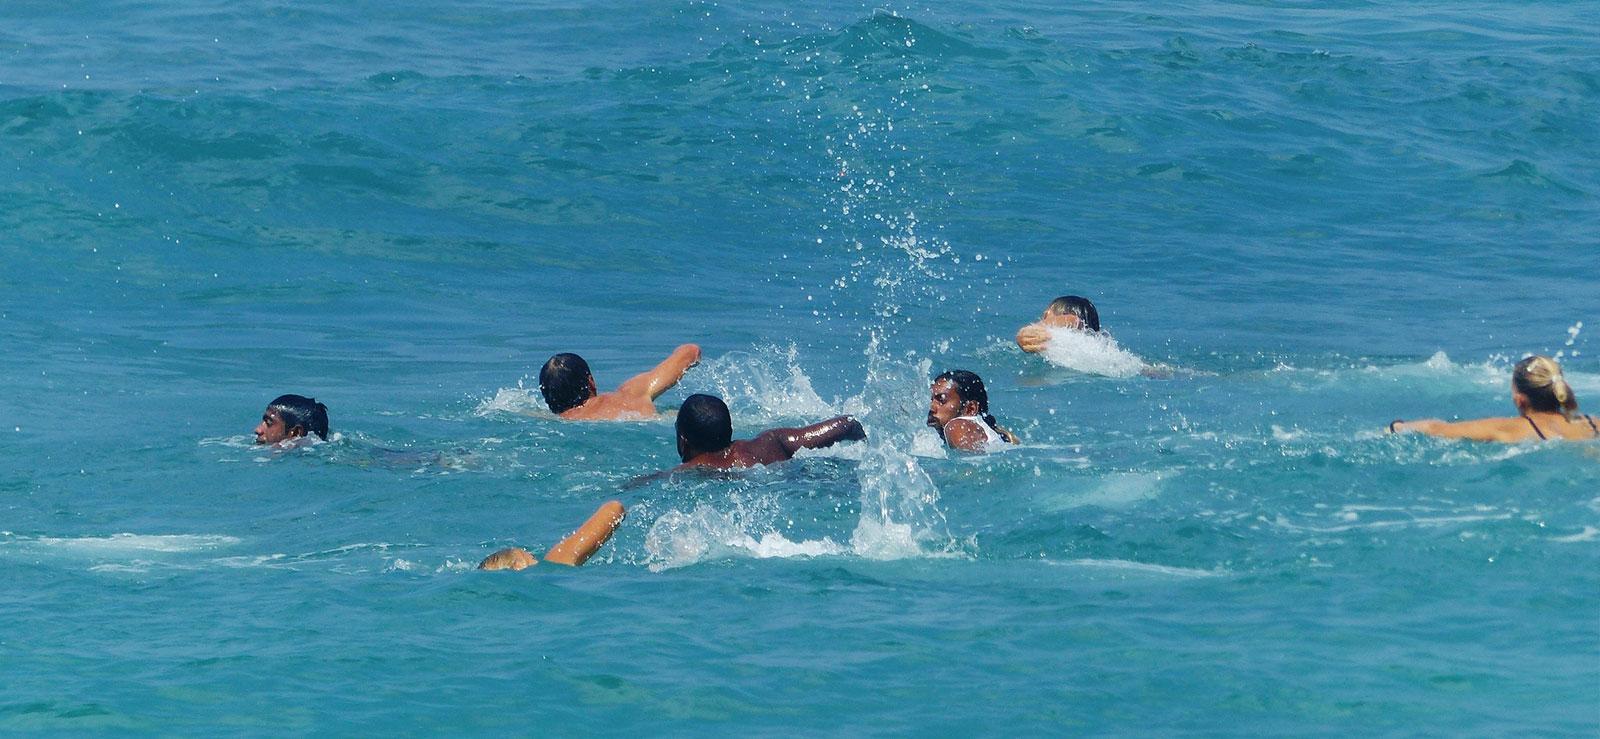 isa swimming test